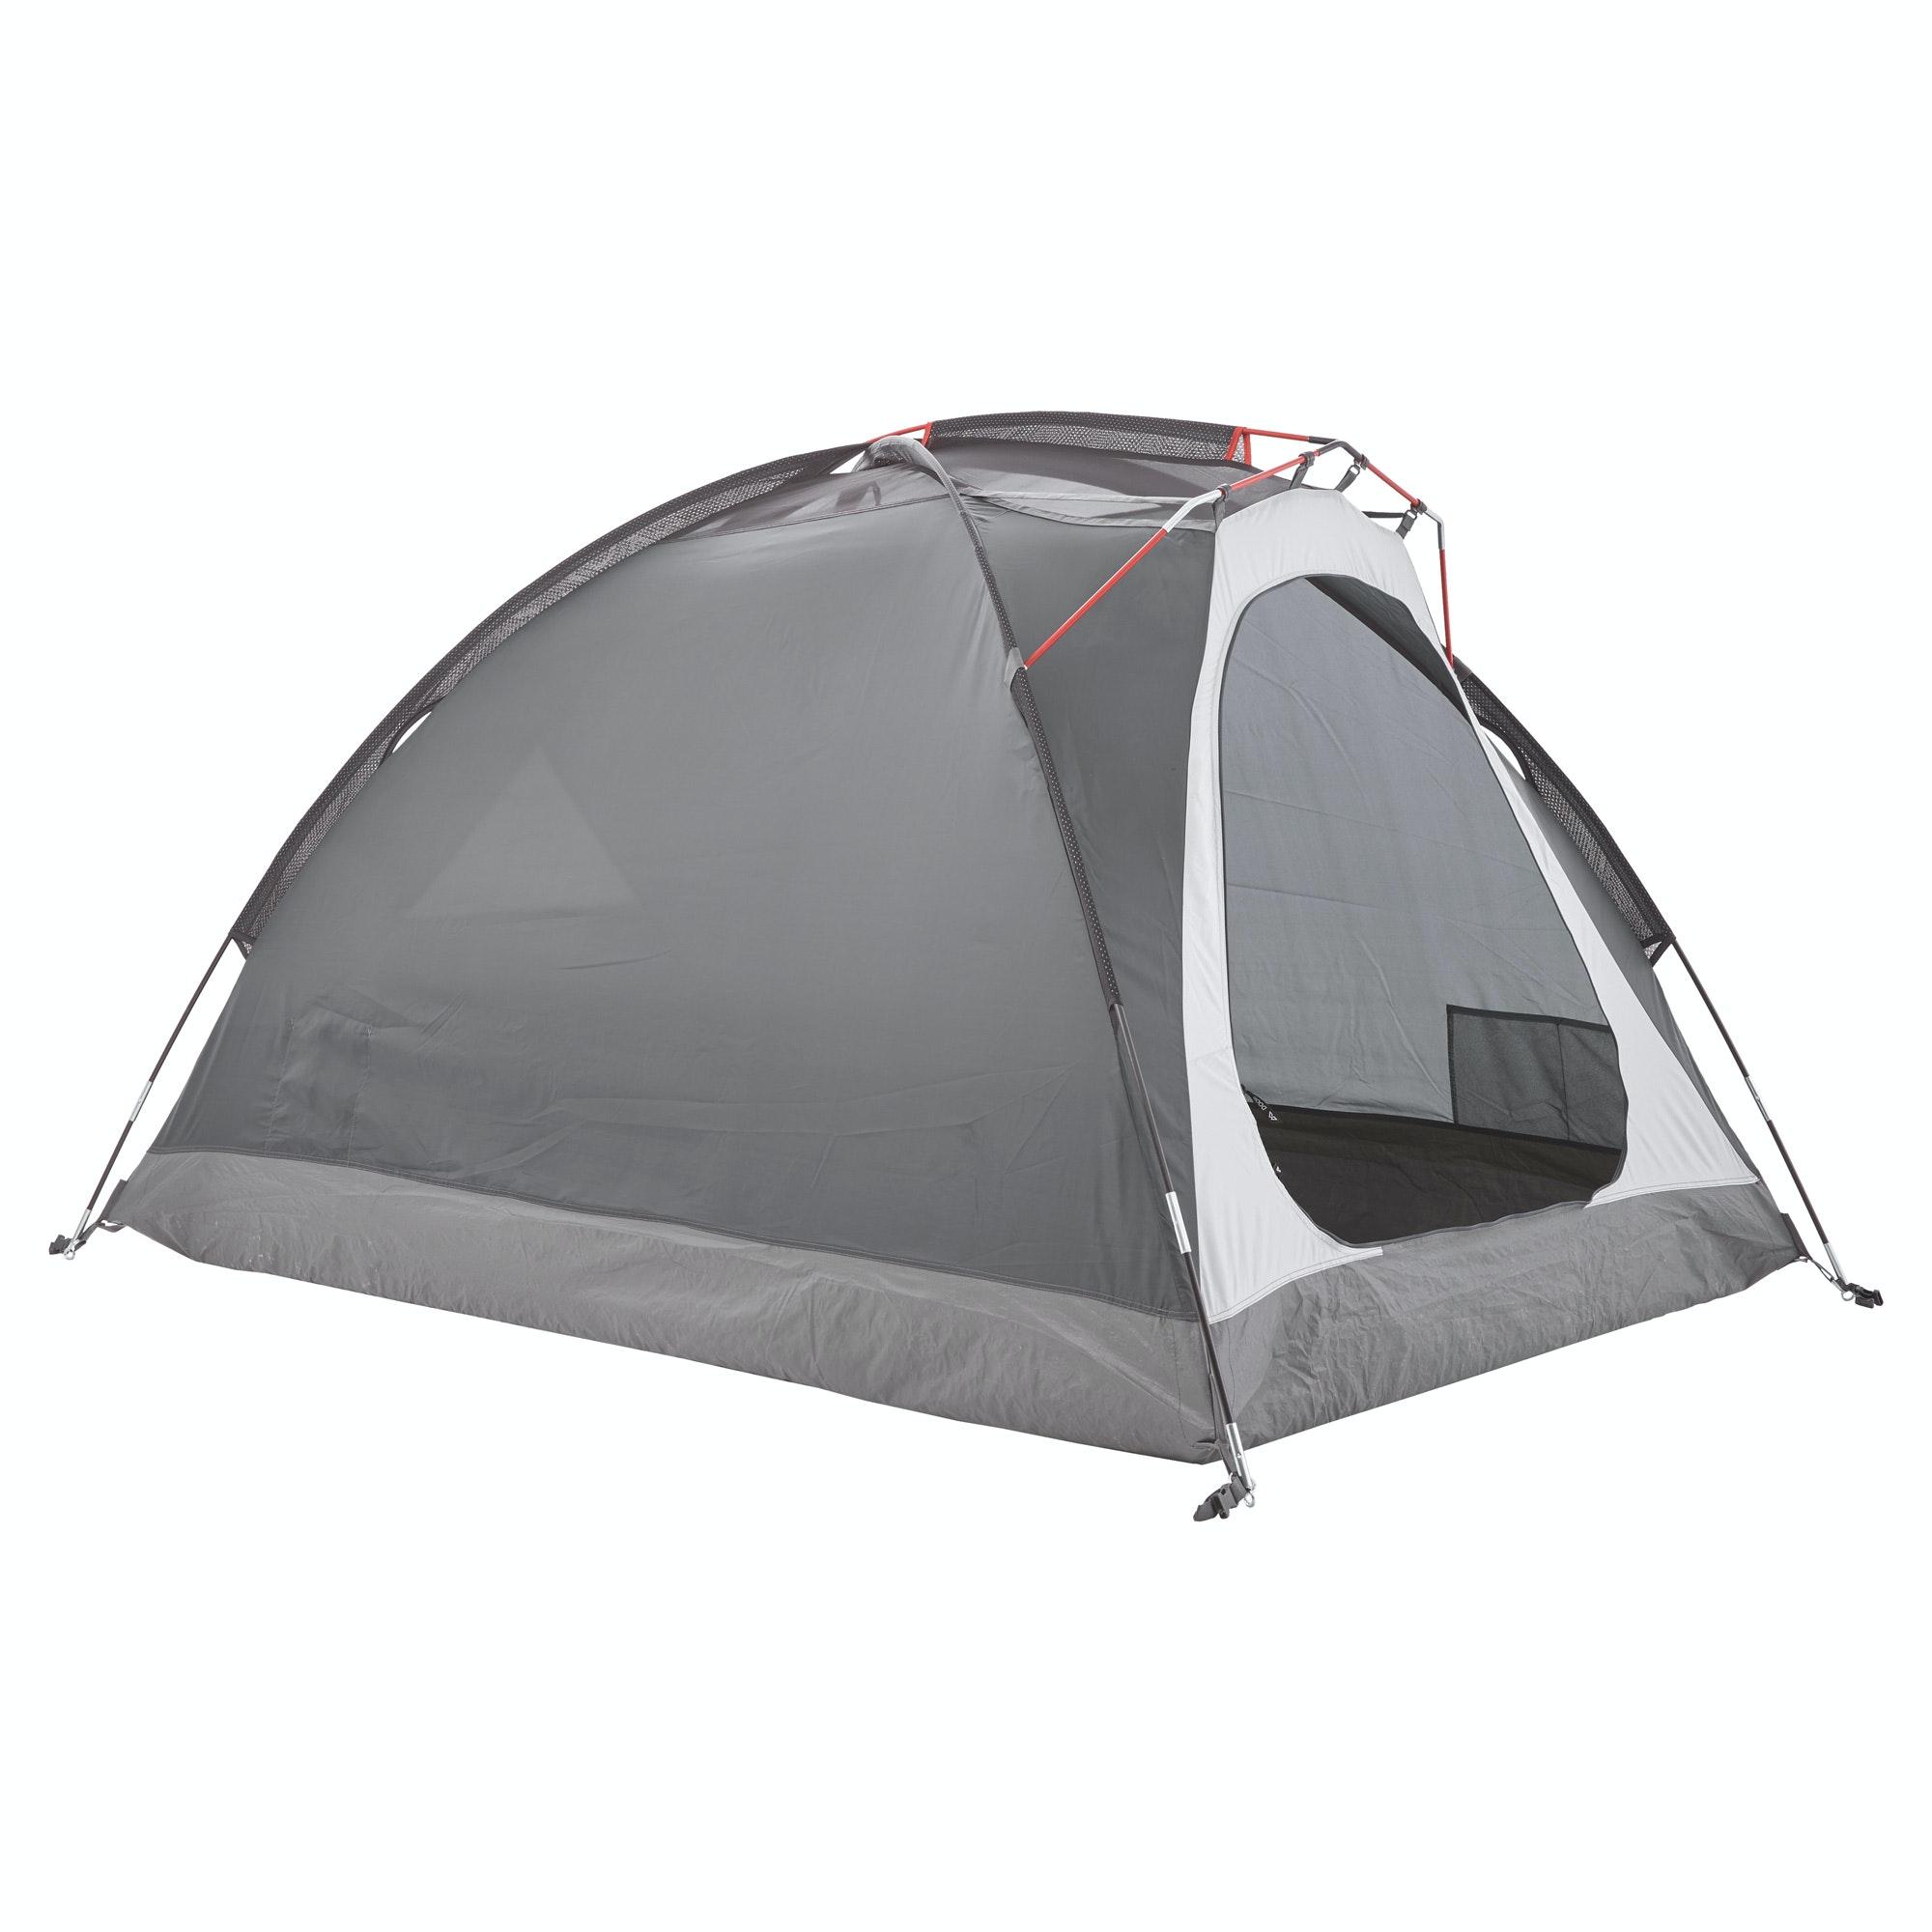 NEW-Kathmandu-Retreat-40-2-Person-Waterproof-Compact-Camping-Hiking-Tent thumbnail 4